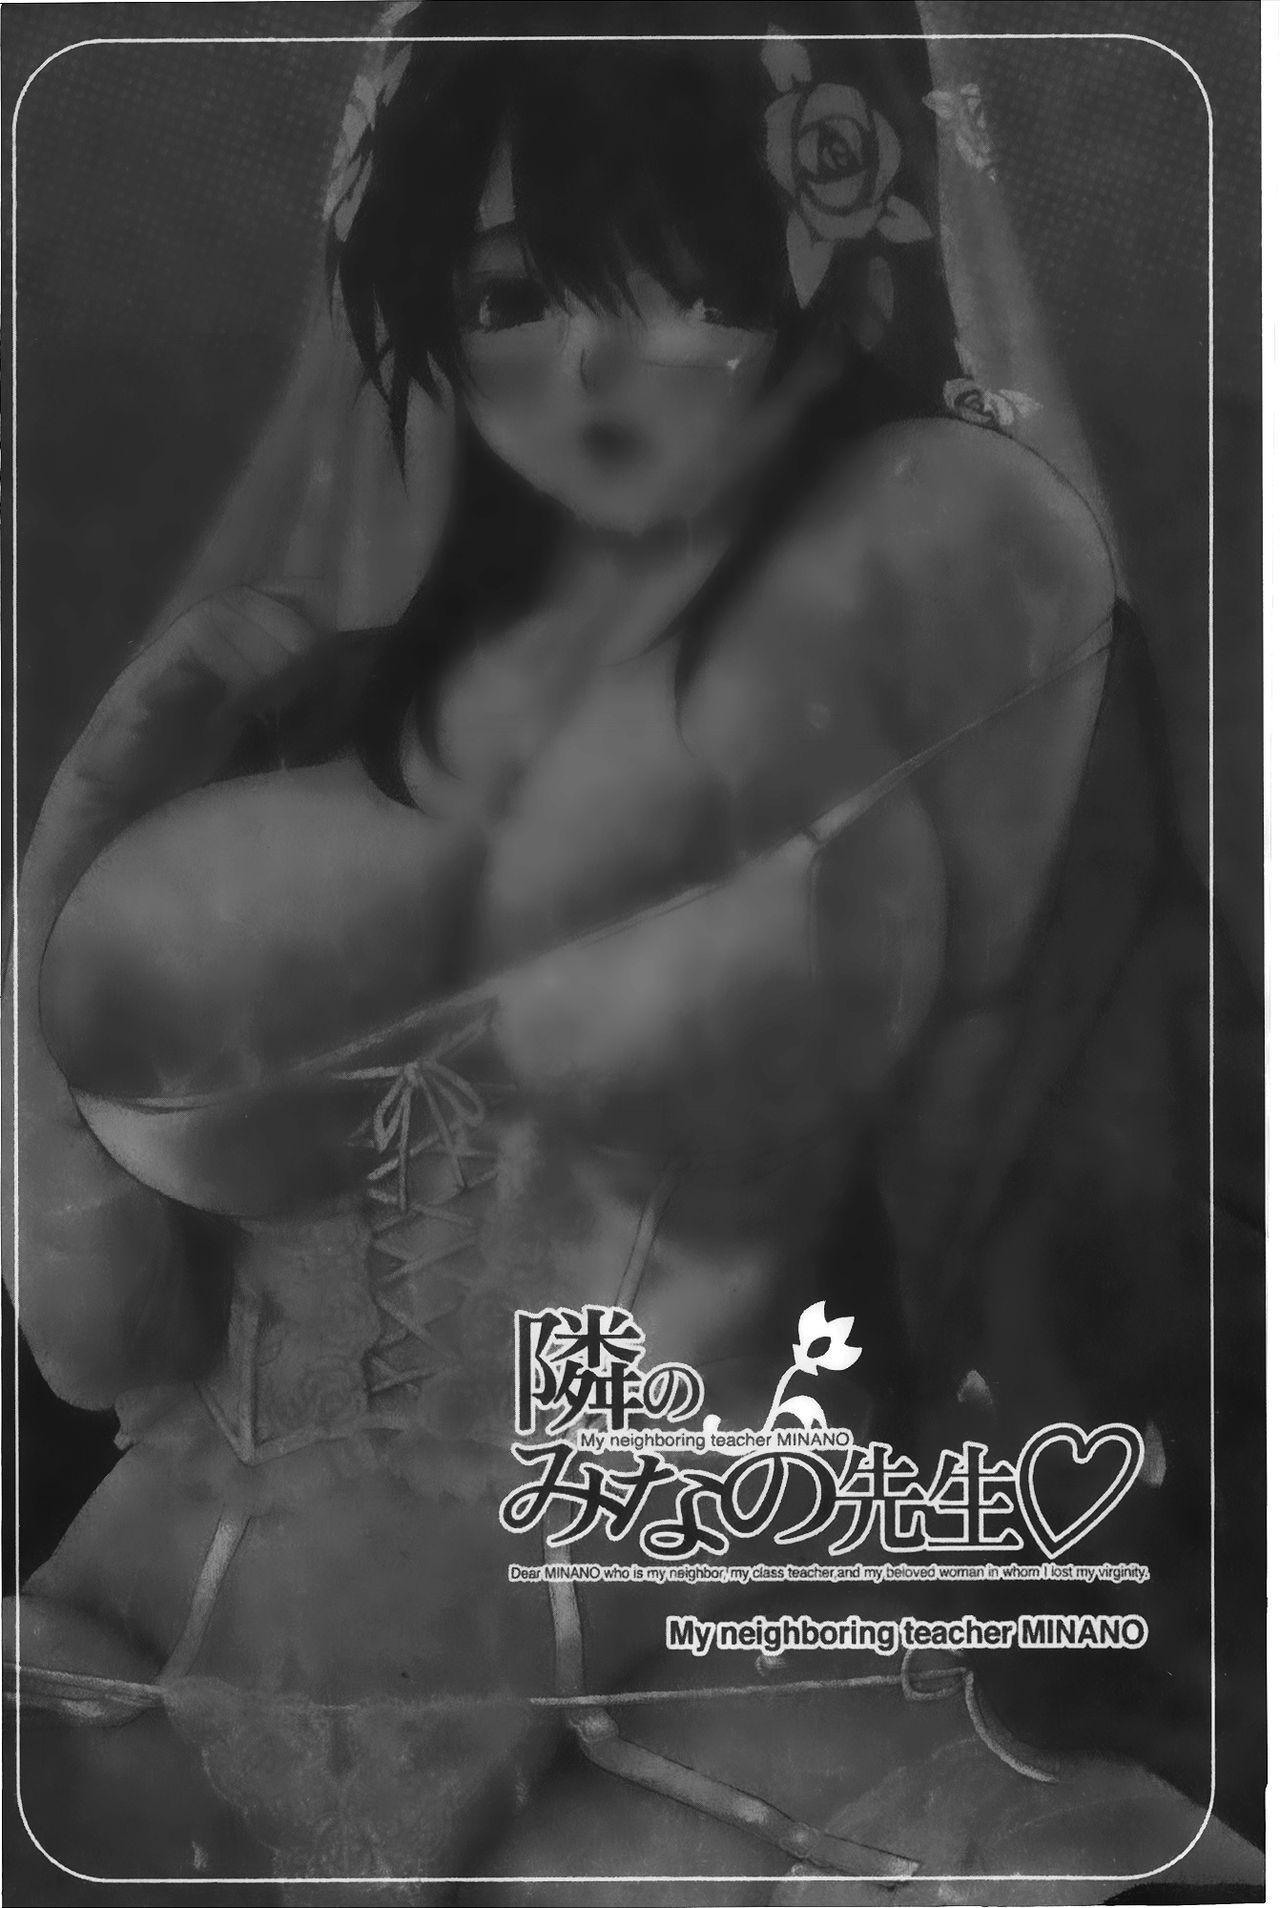 Tonari no Minano Sensei 4 | 隔壁的美奈乃老師 4 52